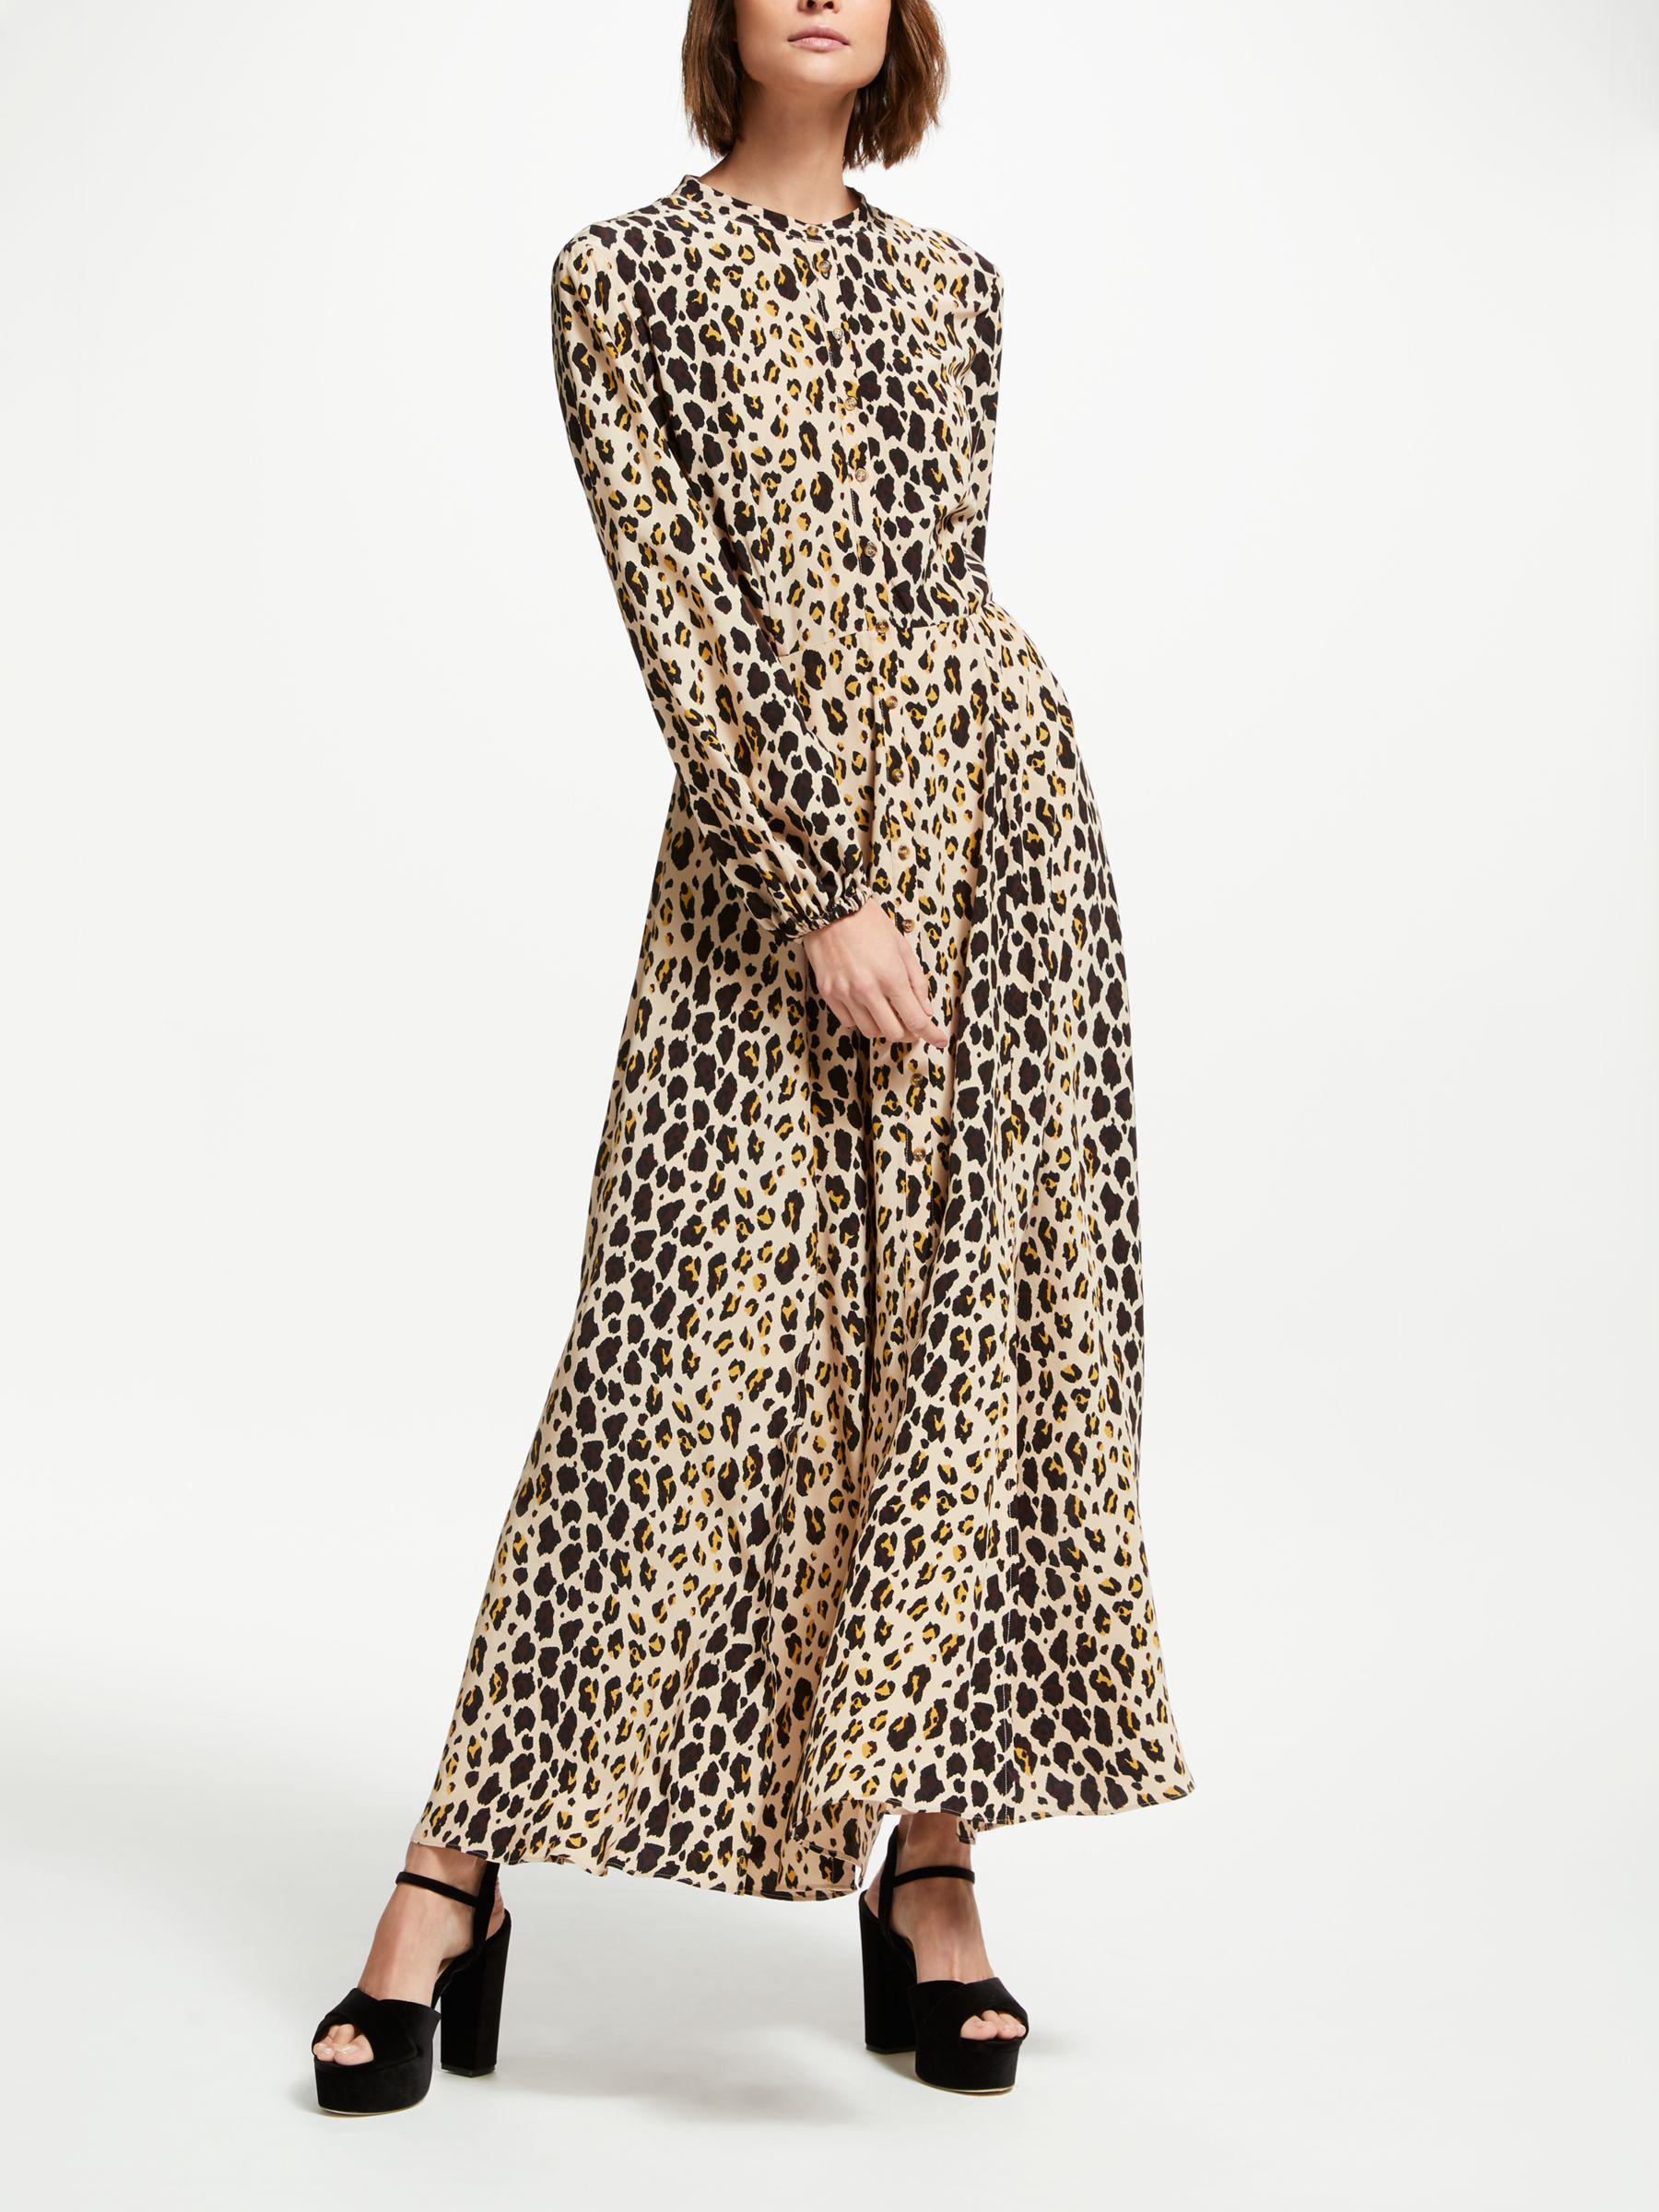 Somerset by Alice Temperley. Women s Leopard Print Maxi Dress 294ed98d7